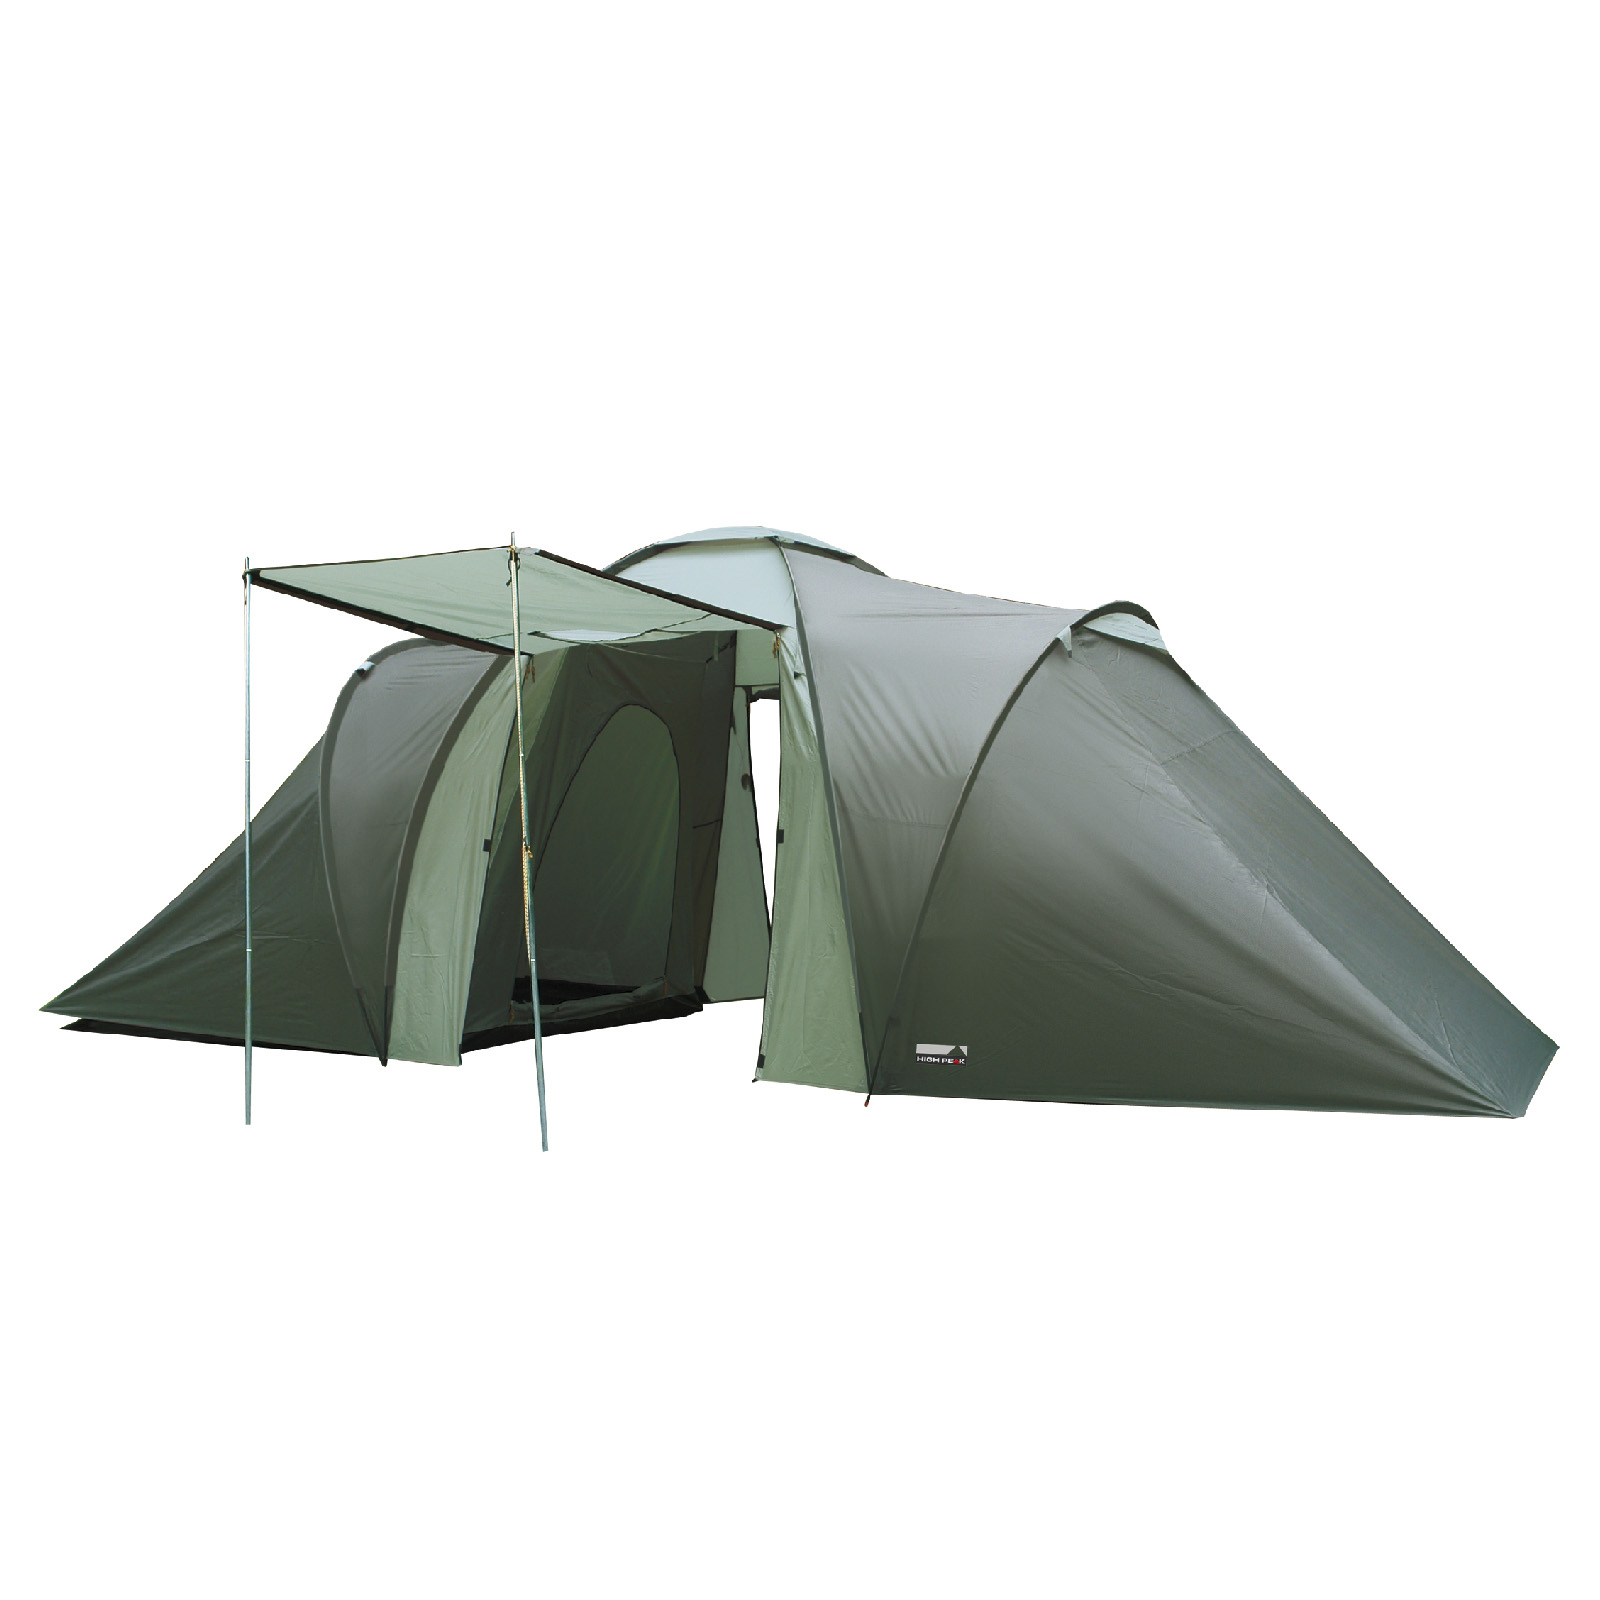 Camping Zelt 8 Mann : Zelt personen high peak como mann familienzelt tunnel